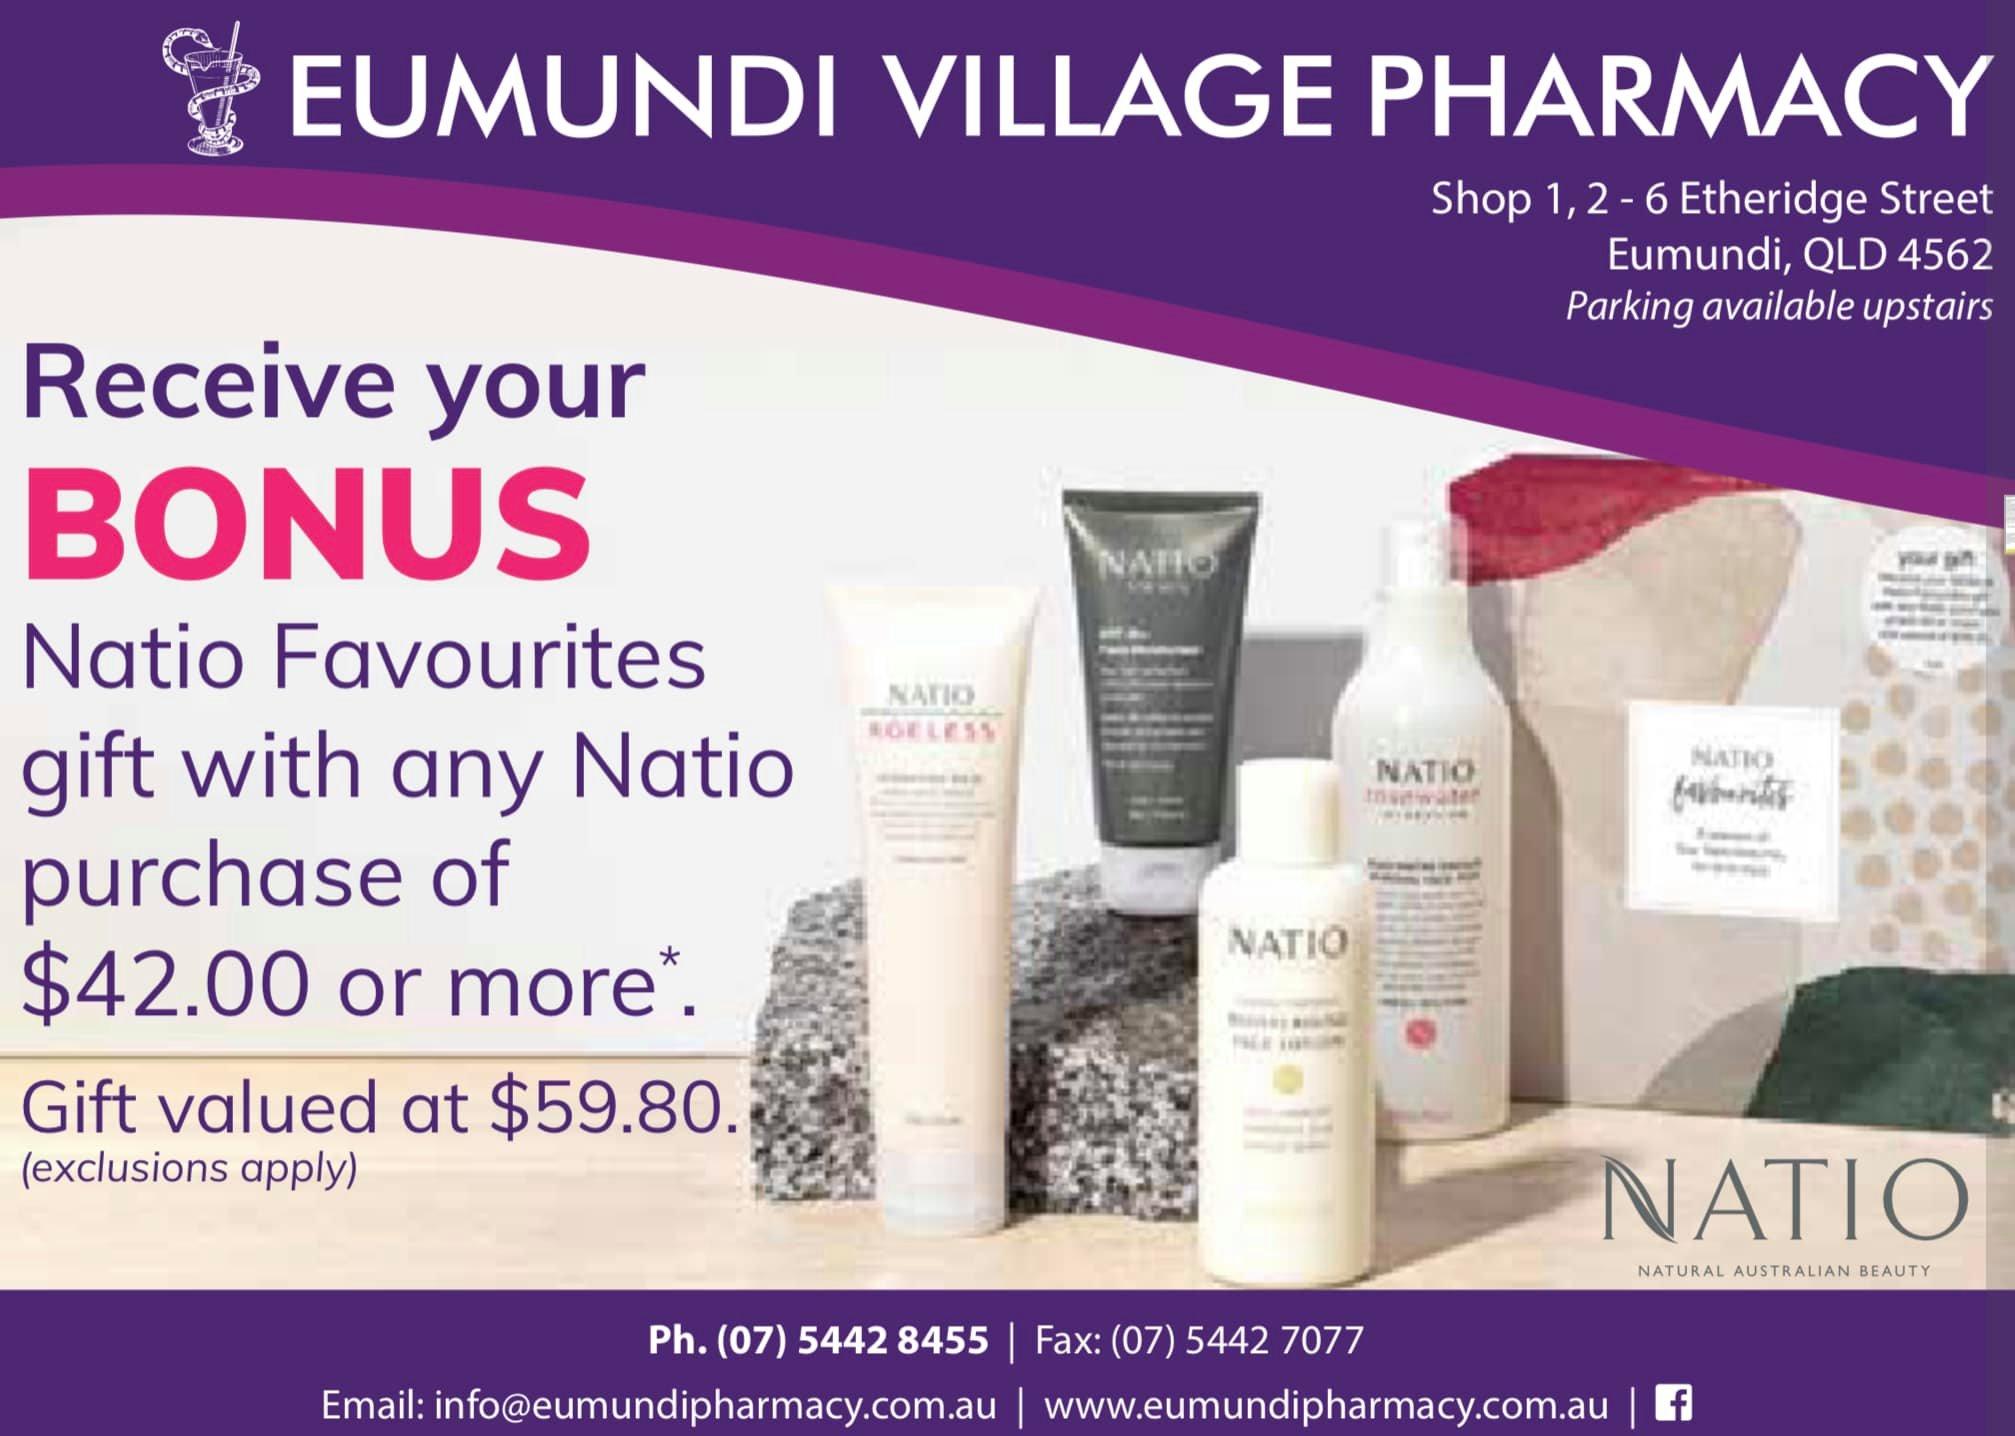 Natio BONUS available at Eumundi Village Pharmacy